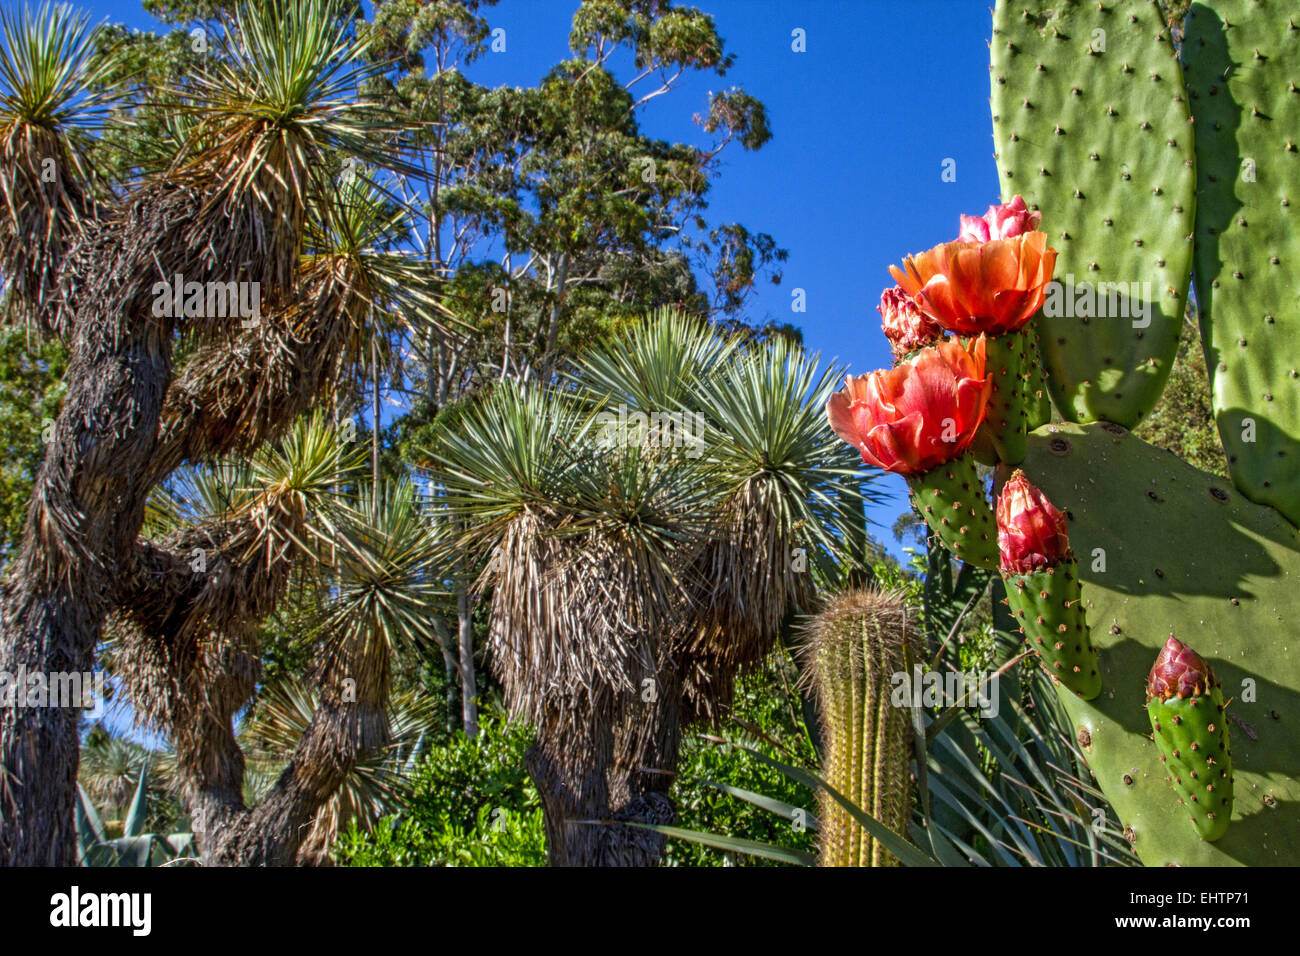 Jardin Zoologique Tropical La Londe Les Maures Var 83 Region